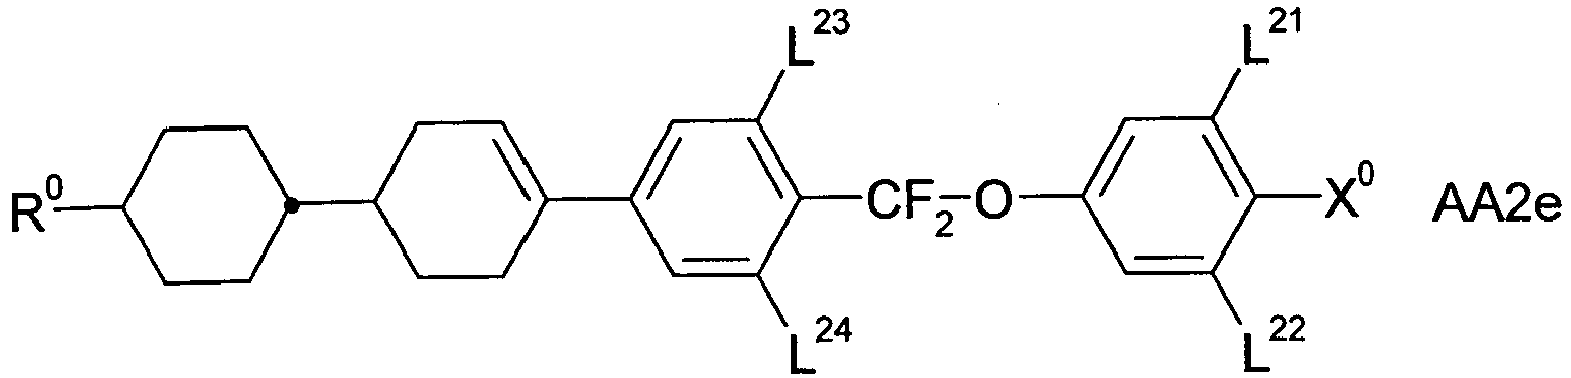 Figure imgb0496